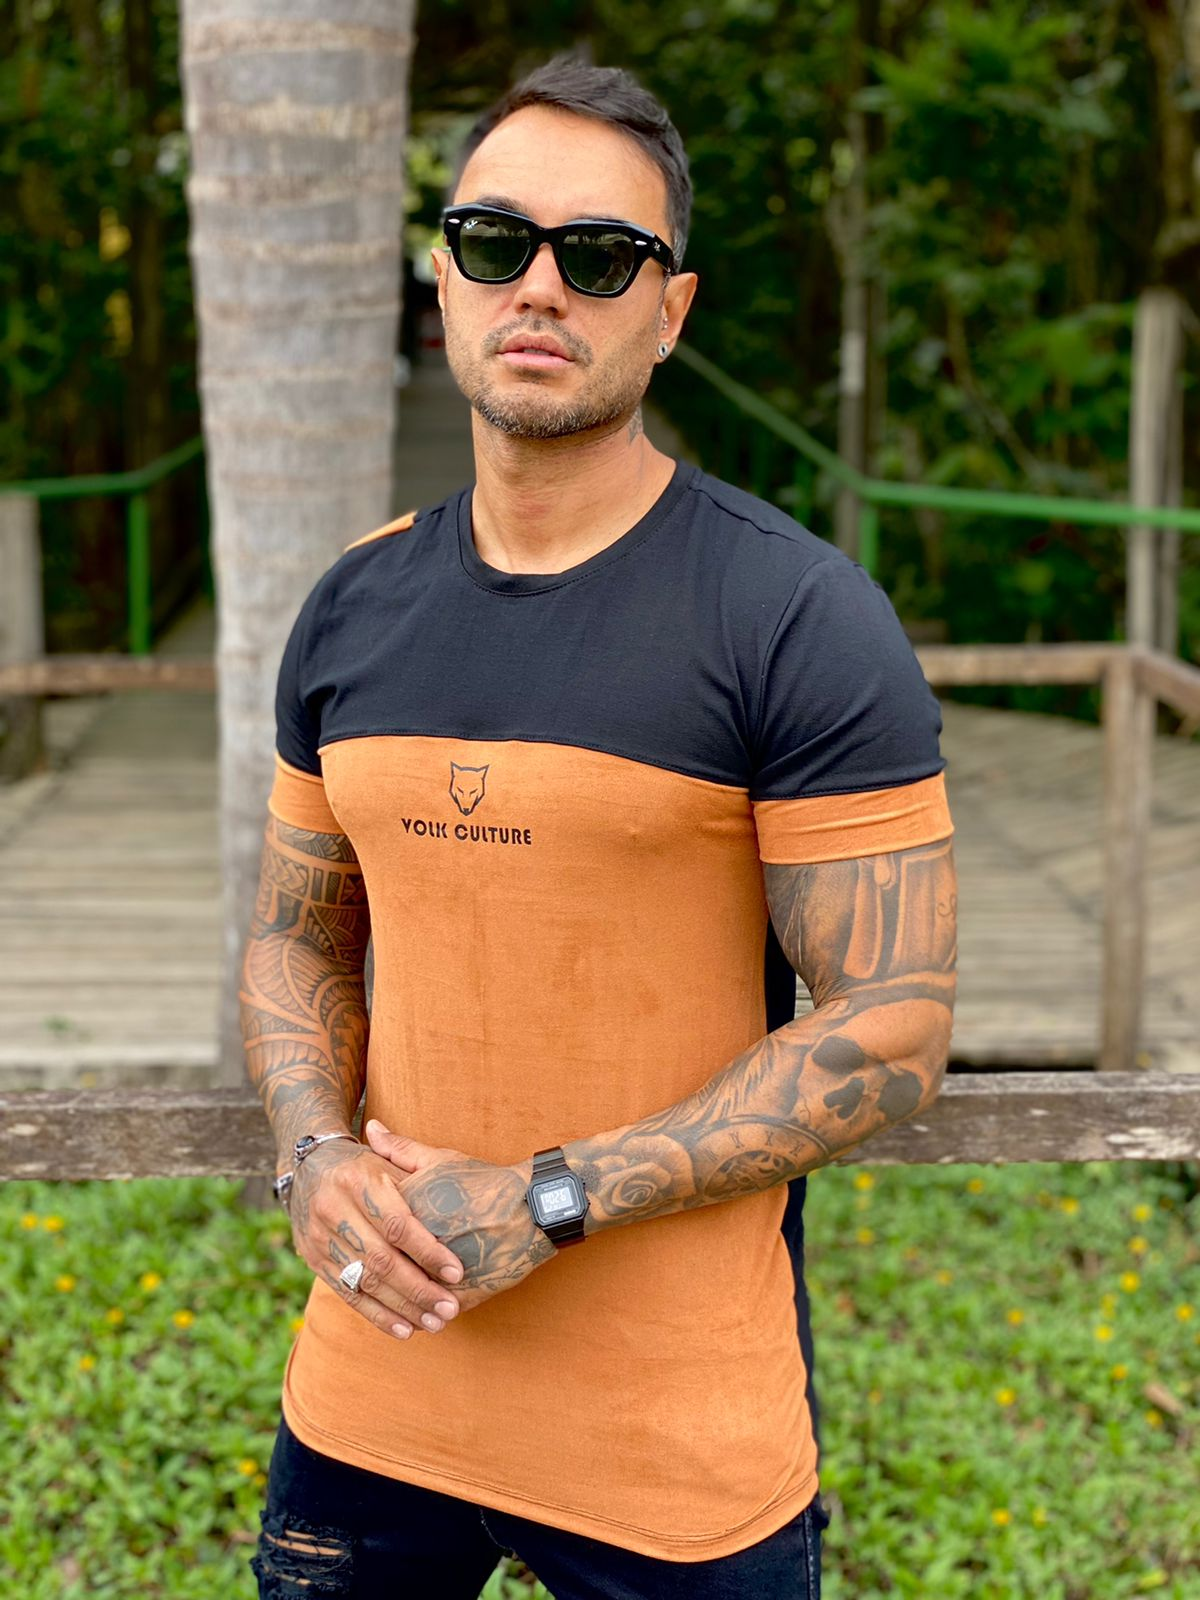 Camiseta Marrom Suede Line Premium Volk Culture  - Harpia Moda - Moda Masculina & Acessórios